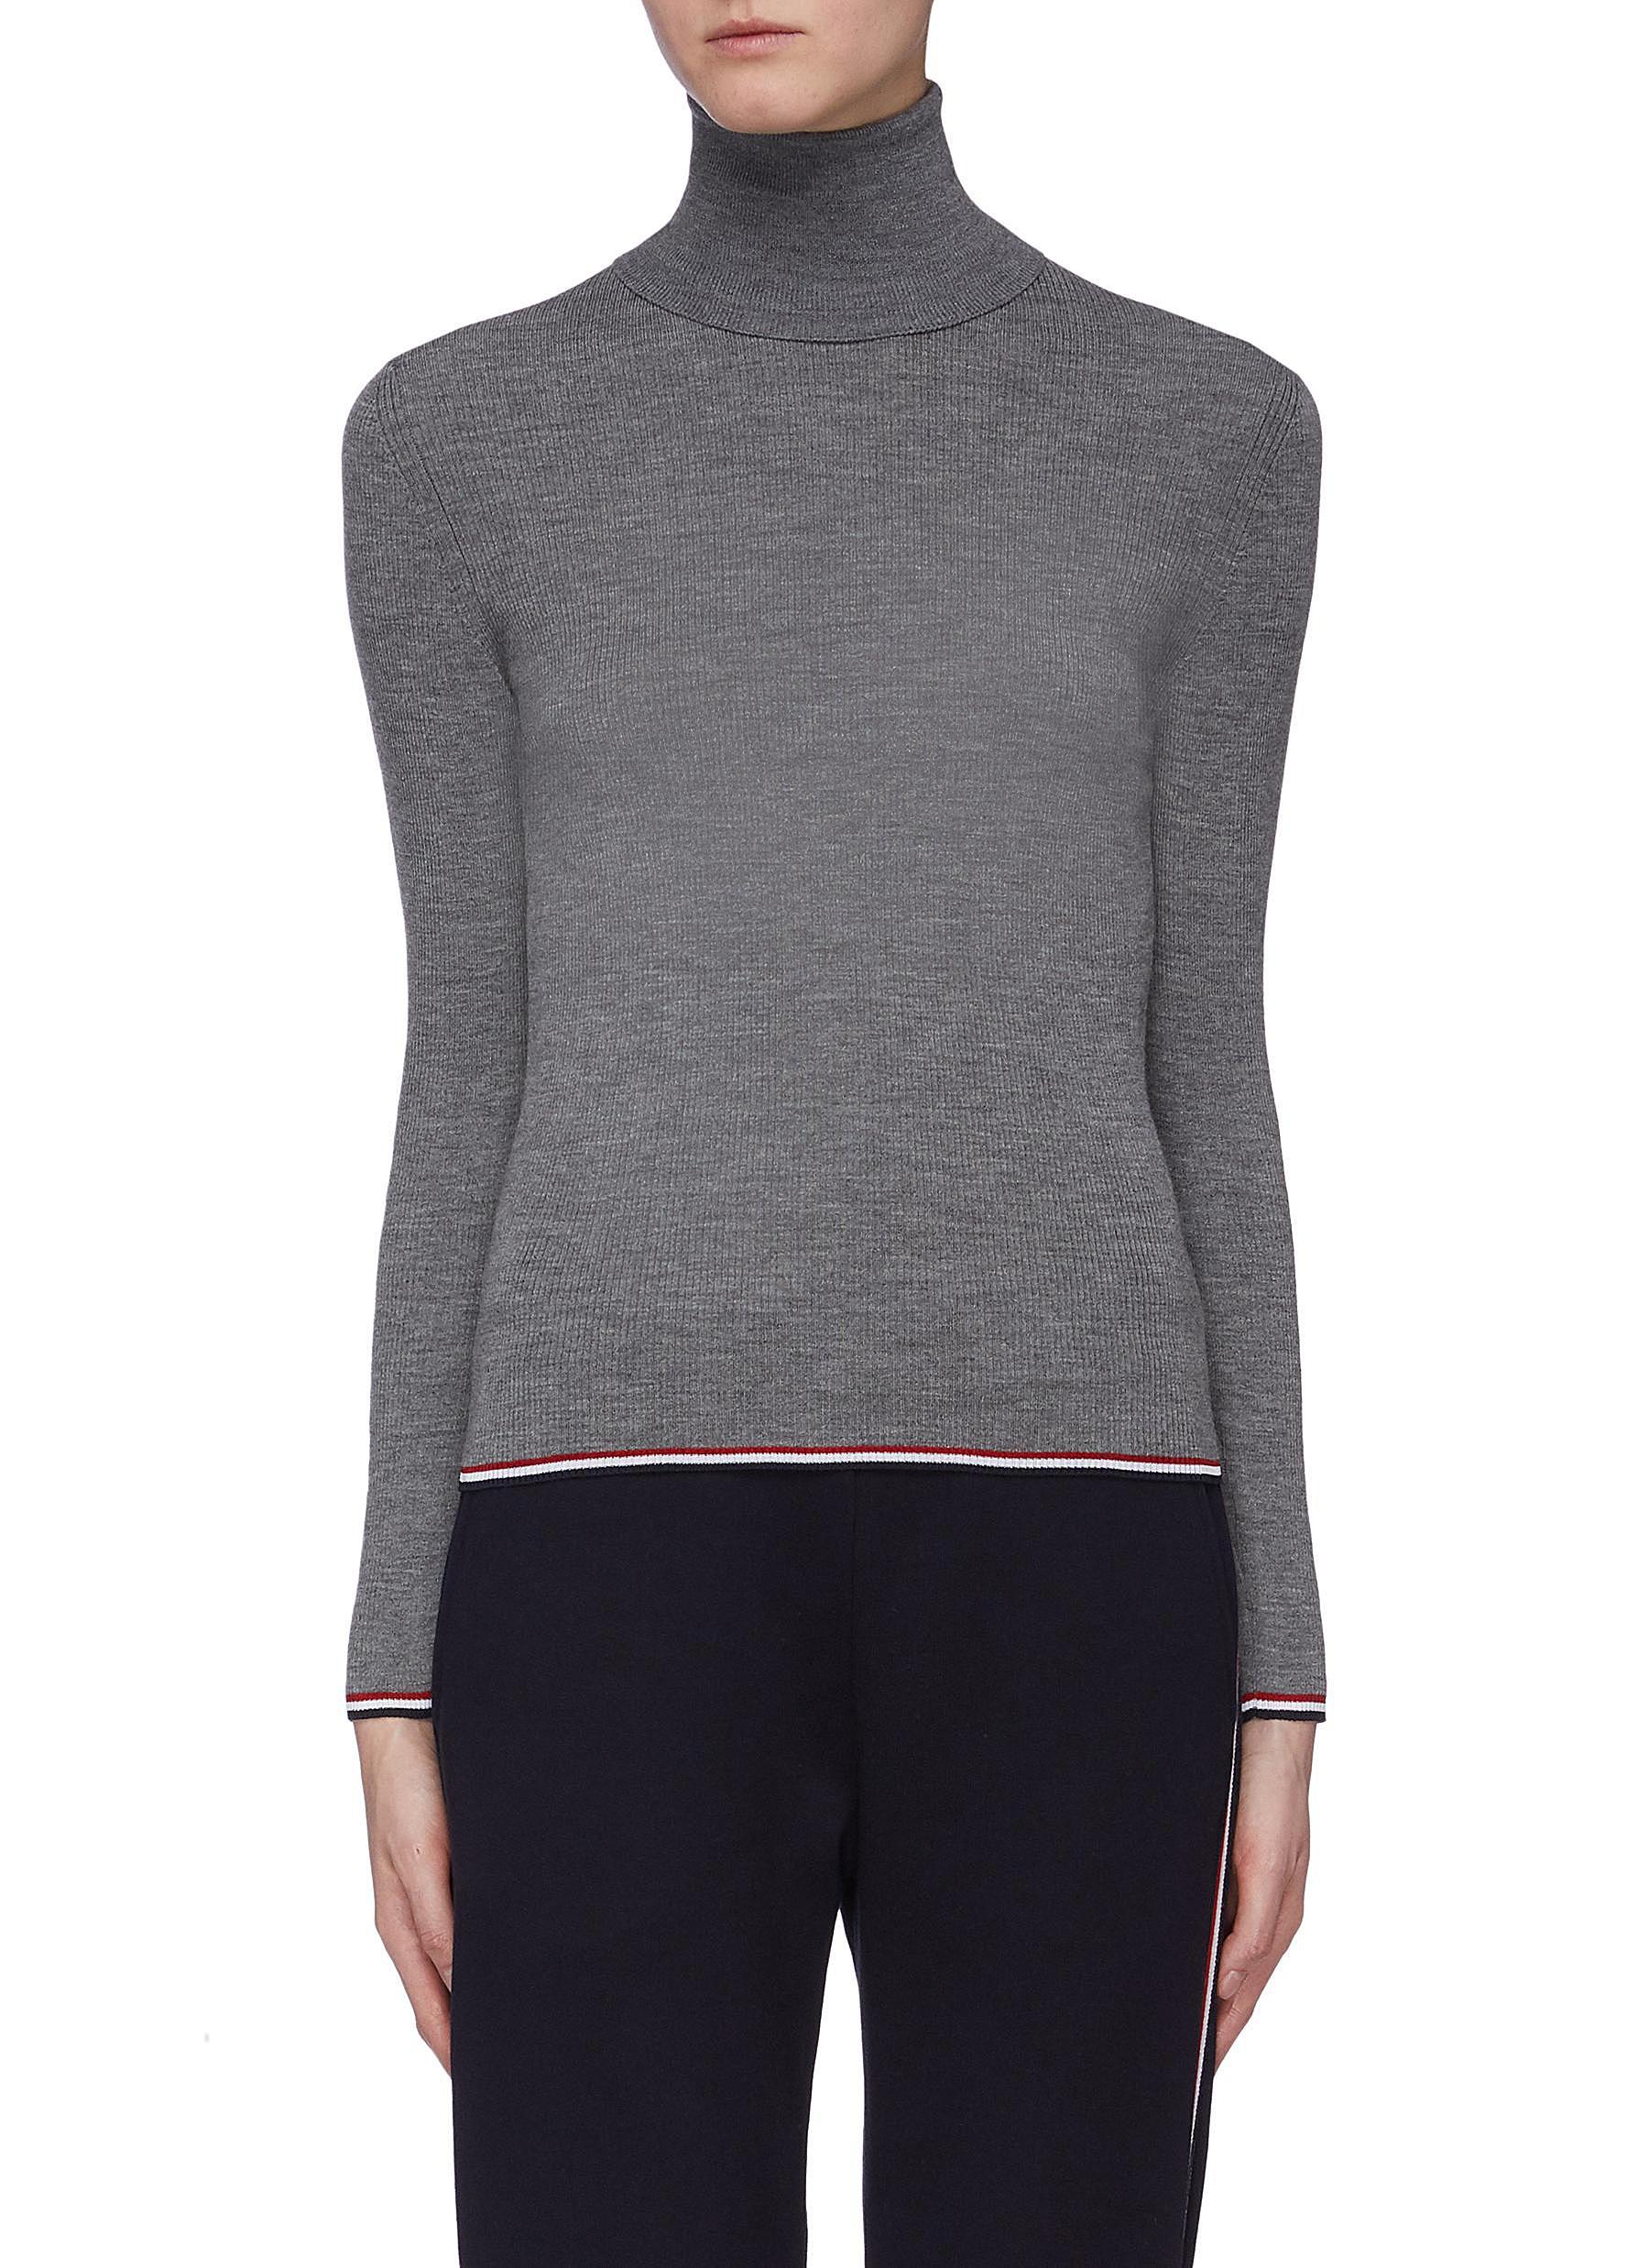 Stripe border rib knit turtleneck sweater by Thom Browne